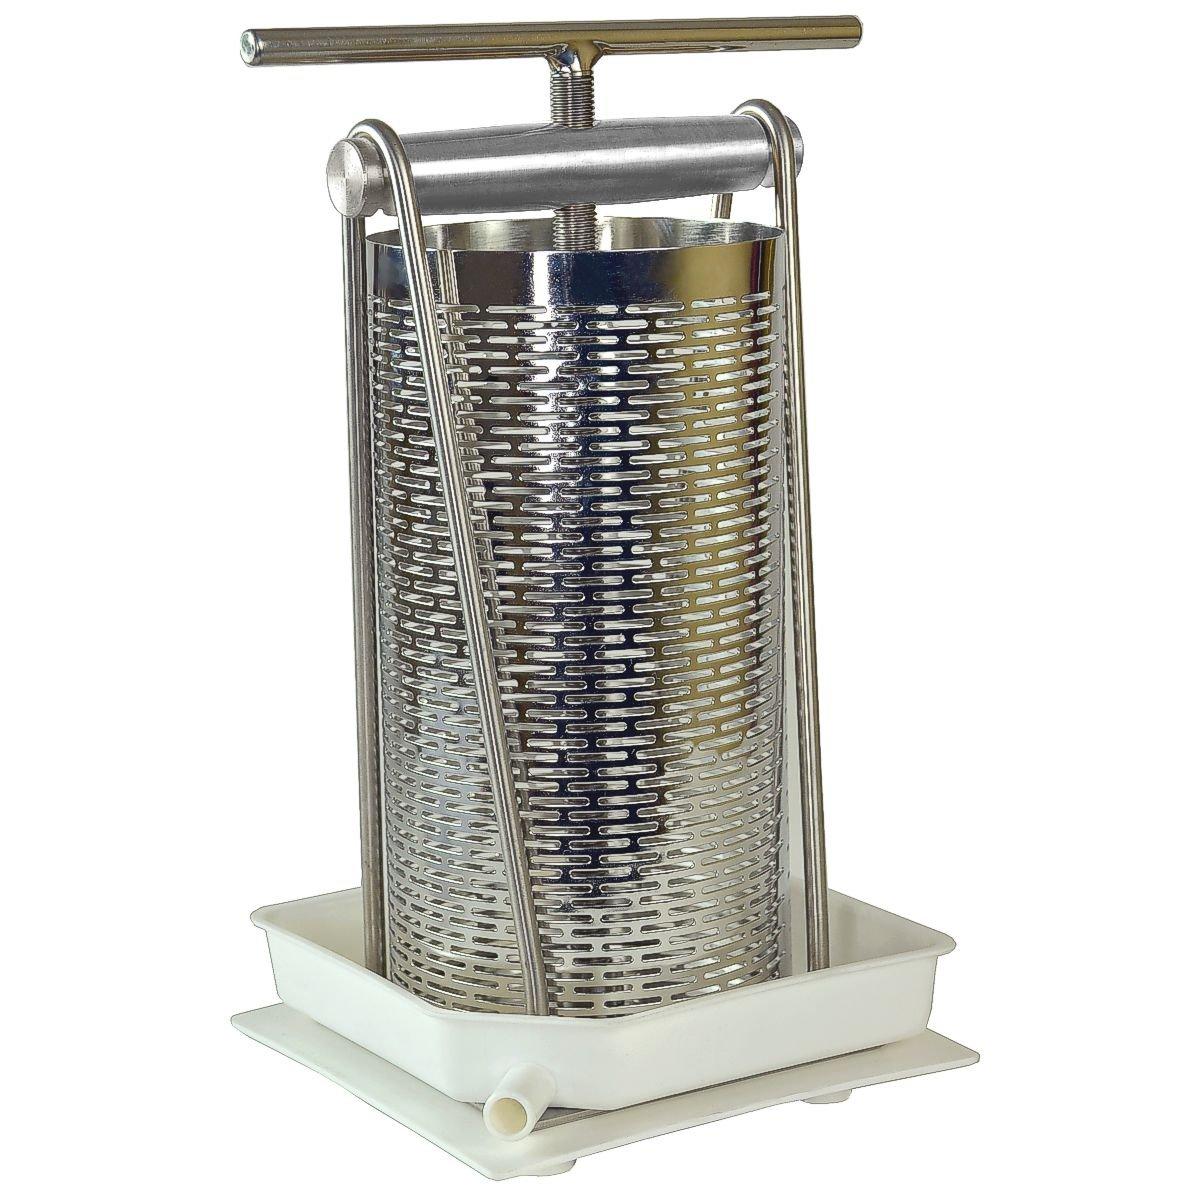 Tabletop Fruit Press 1.25 Gallon